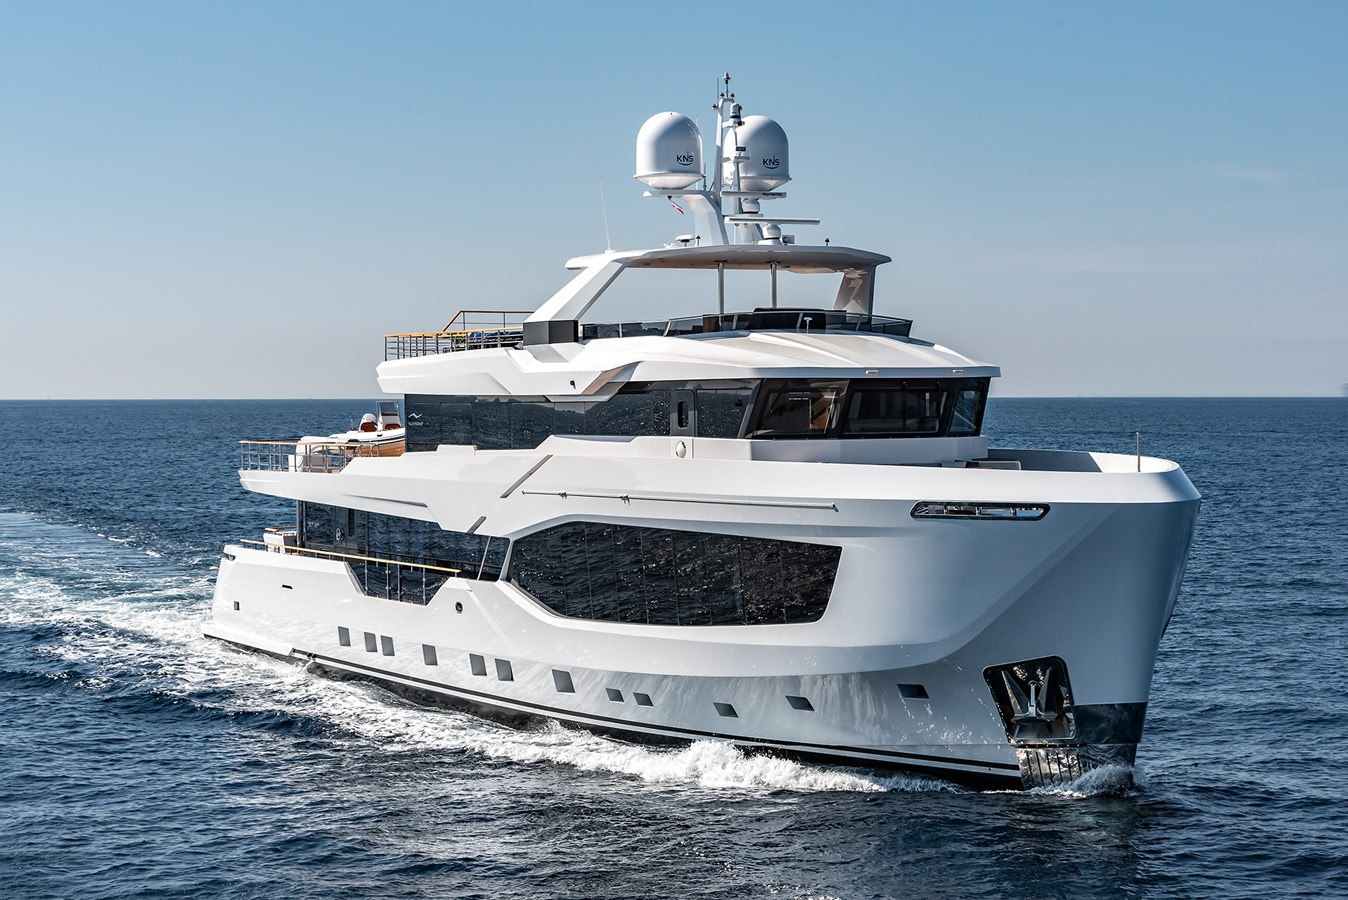 Numarine 37XP Hull #6 yacht for sale